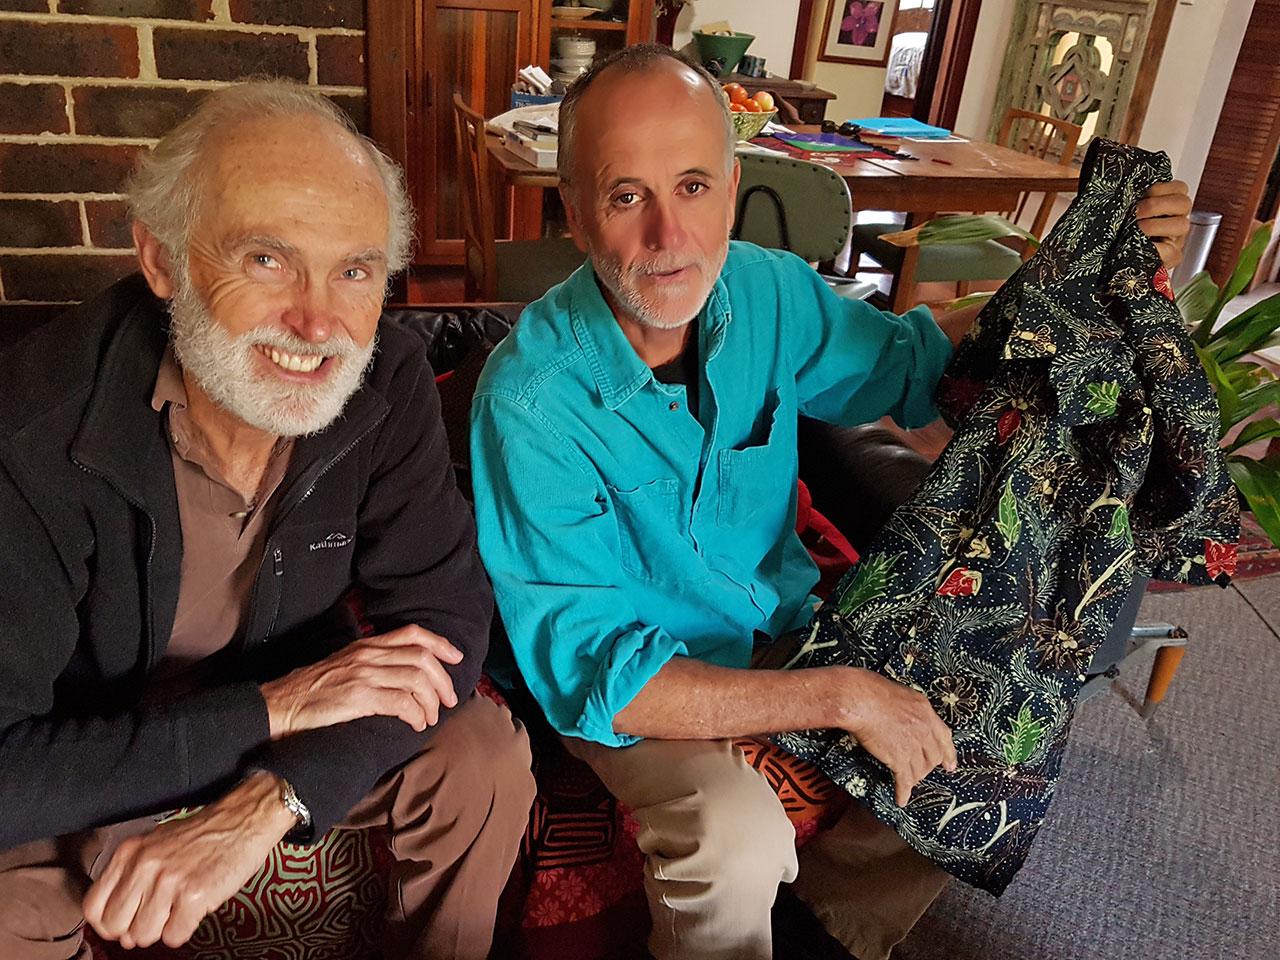 Two men in living room